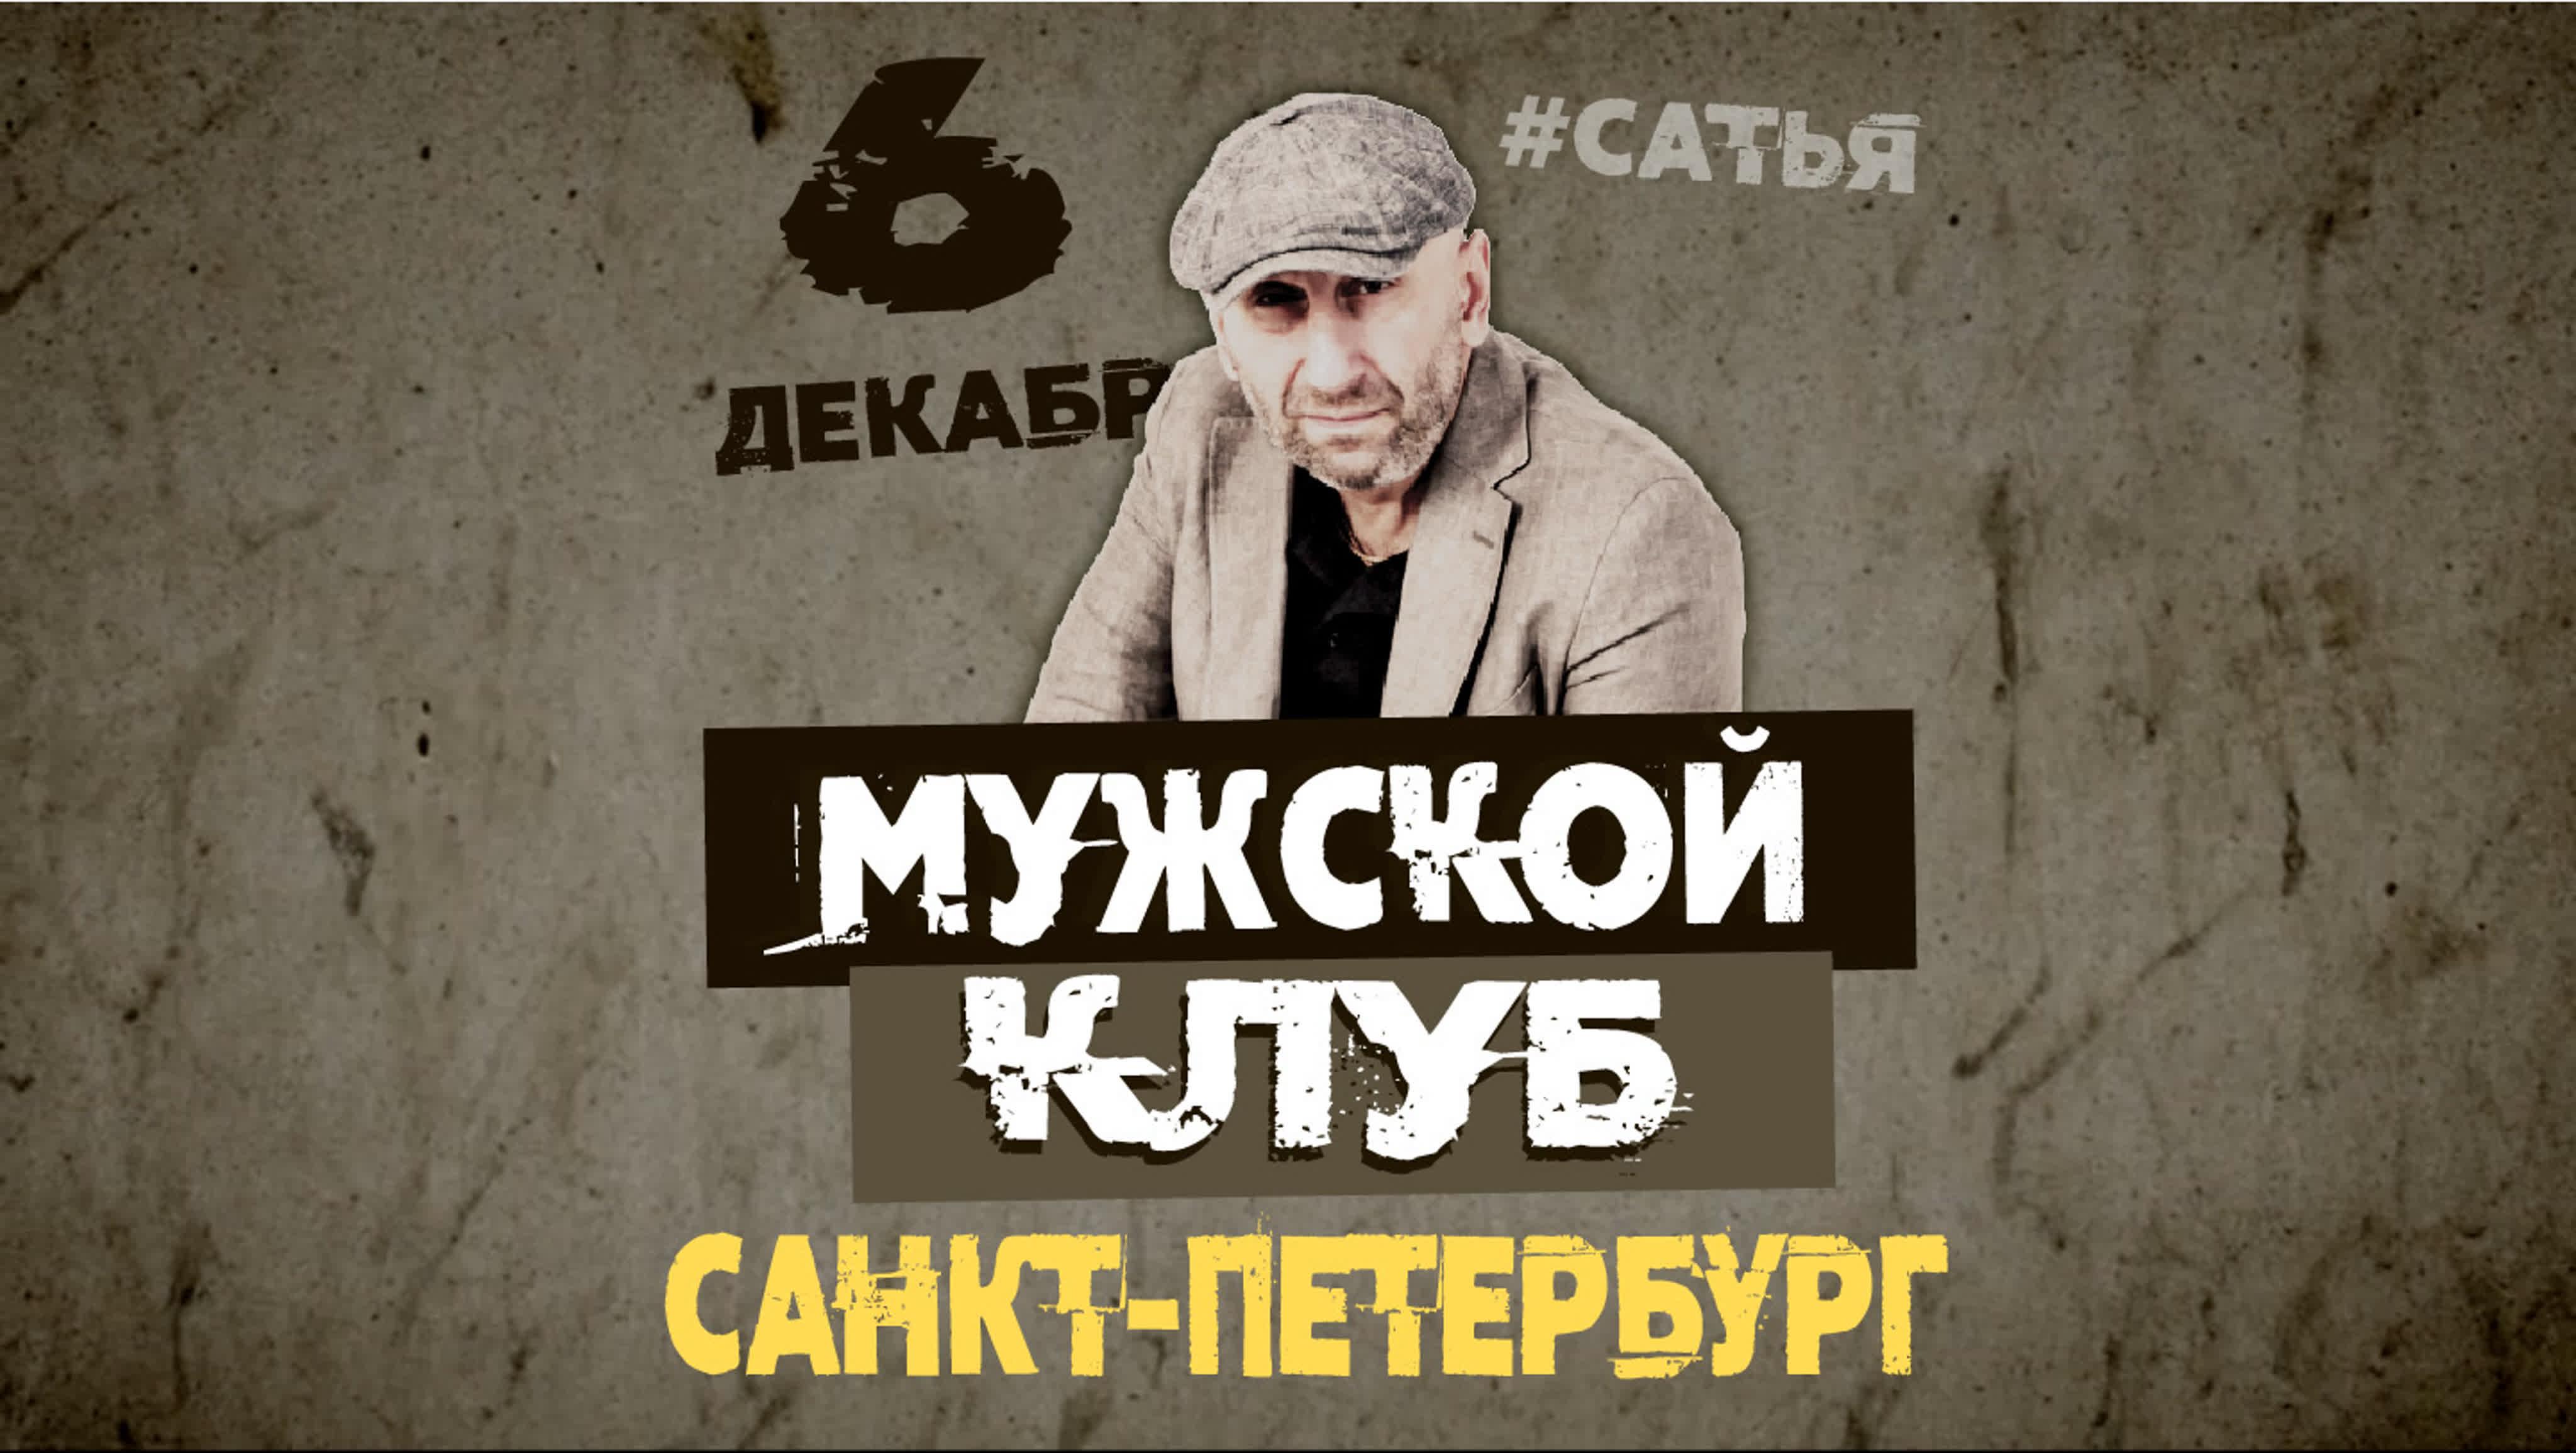 Петербург мужской клуб атрибутика хоккейного клуба динамо москва